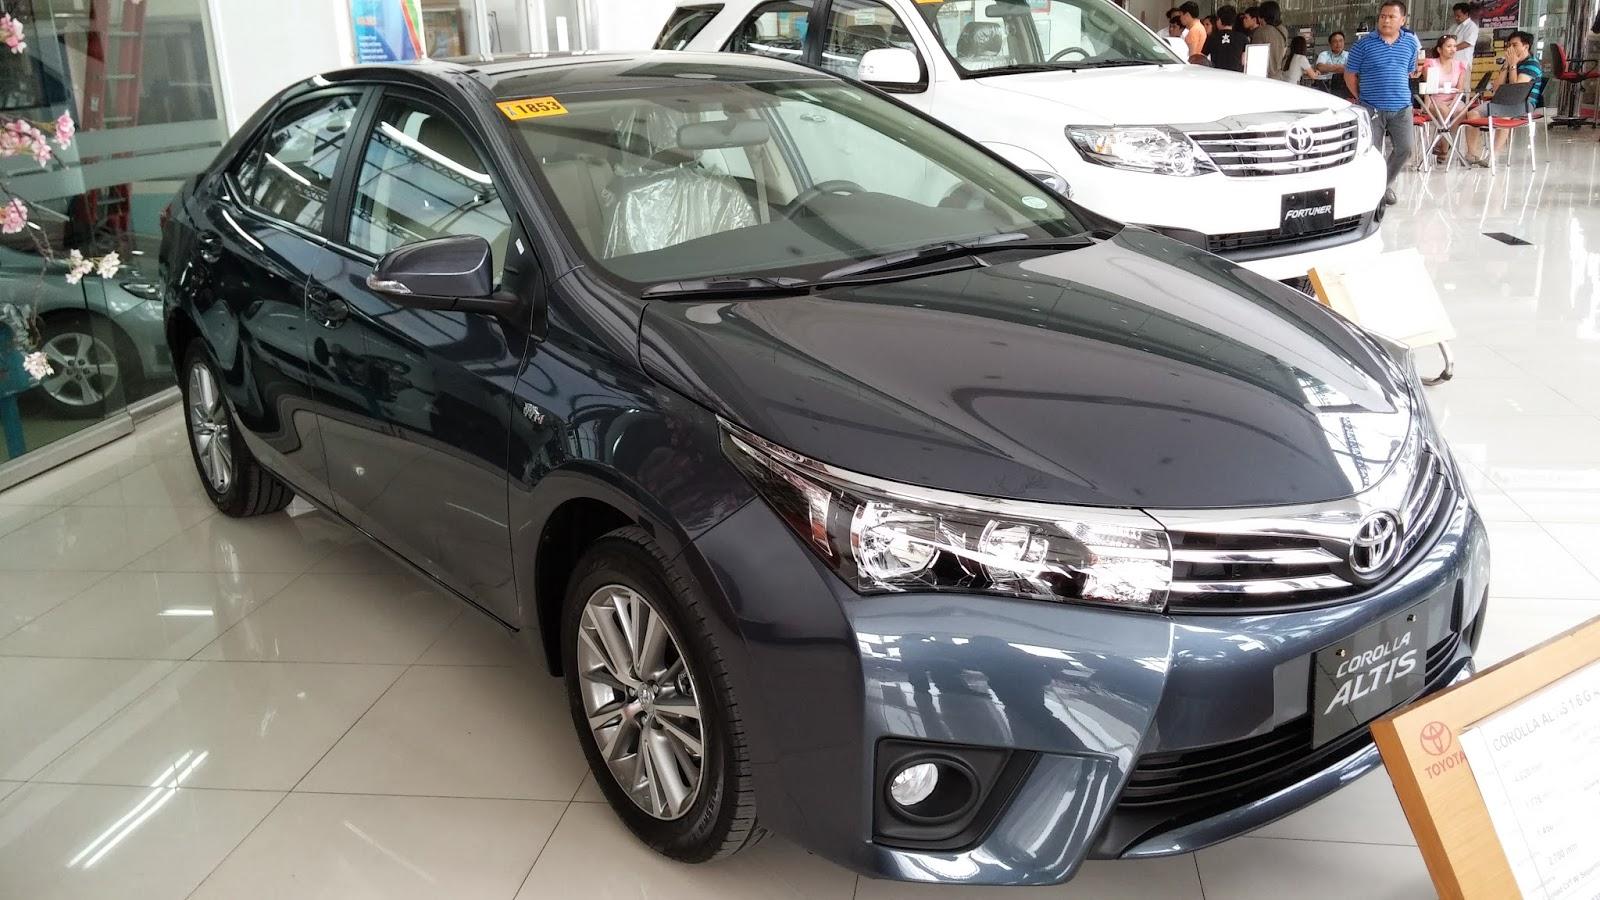 All New Toyota Corolla Altis 2014 ~ Lakbay ATBP